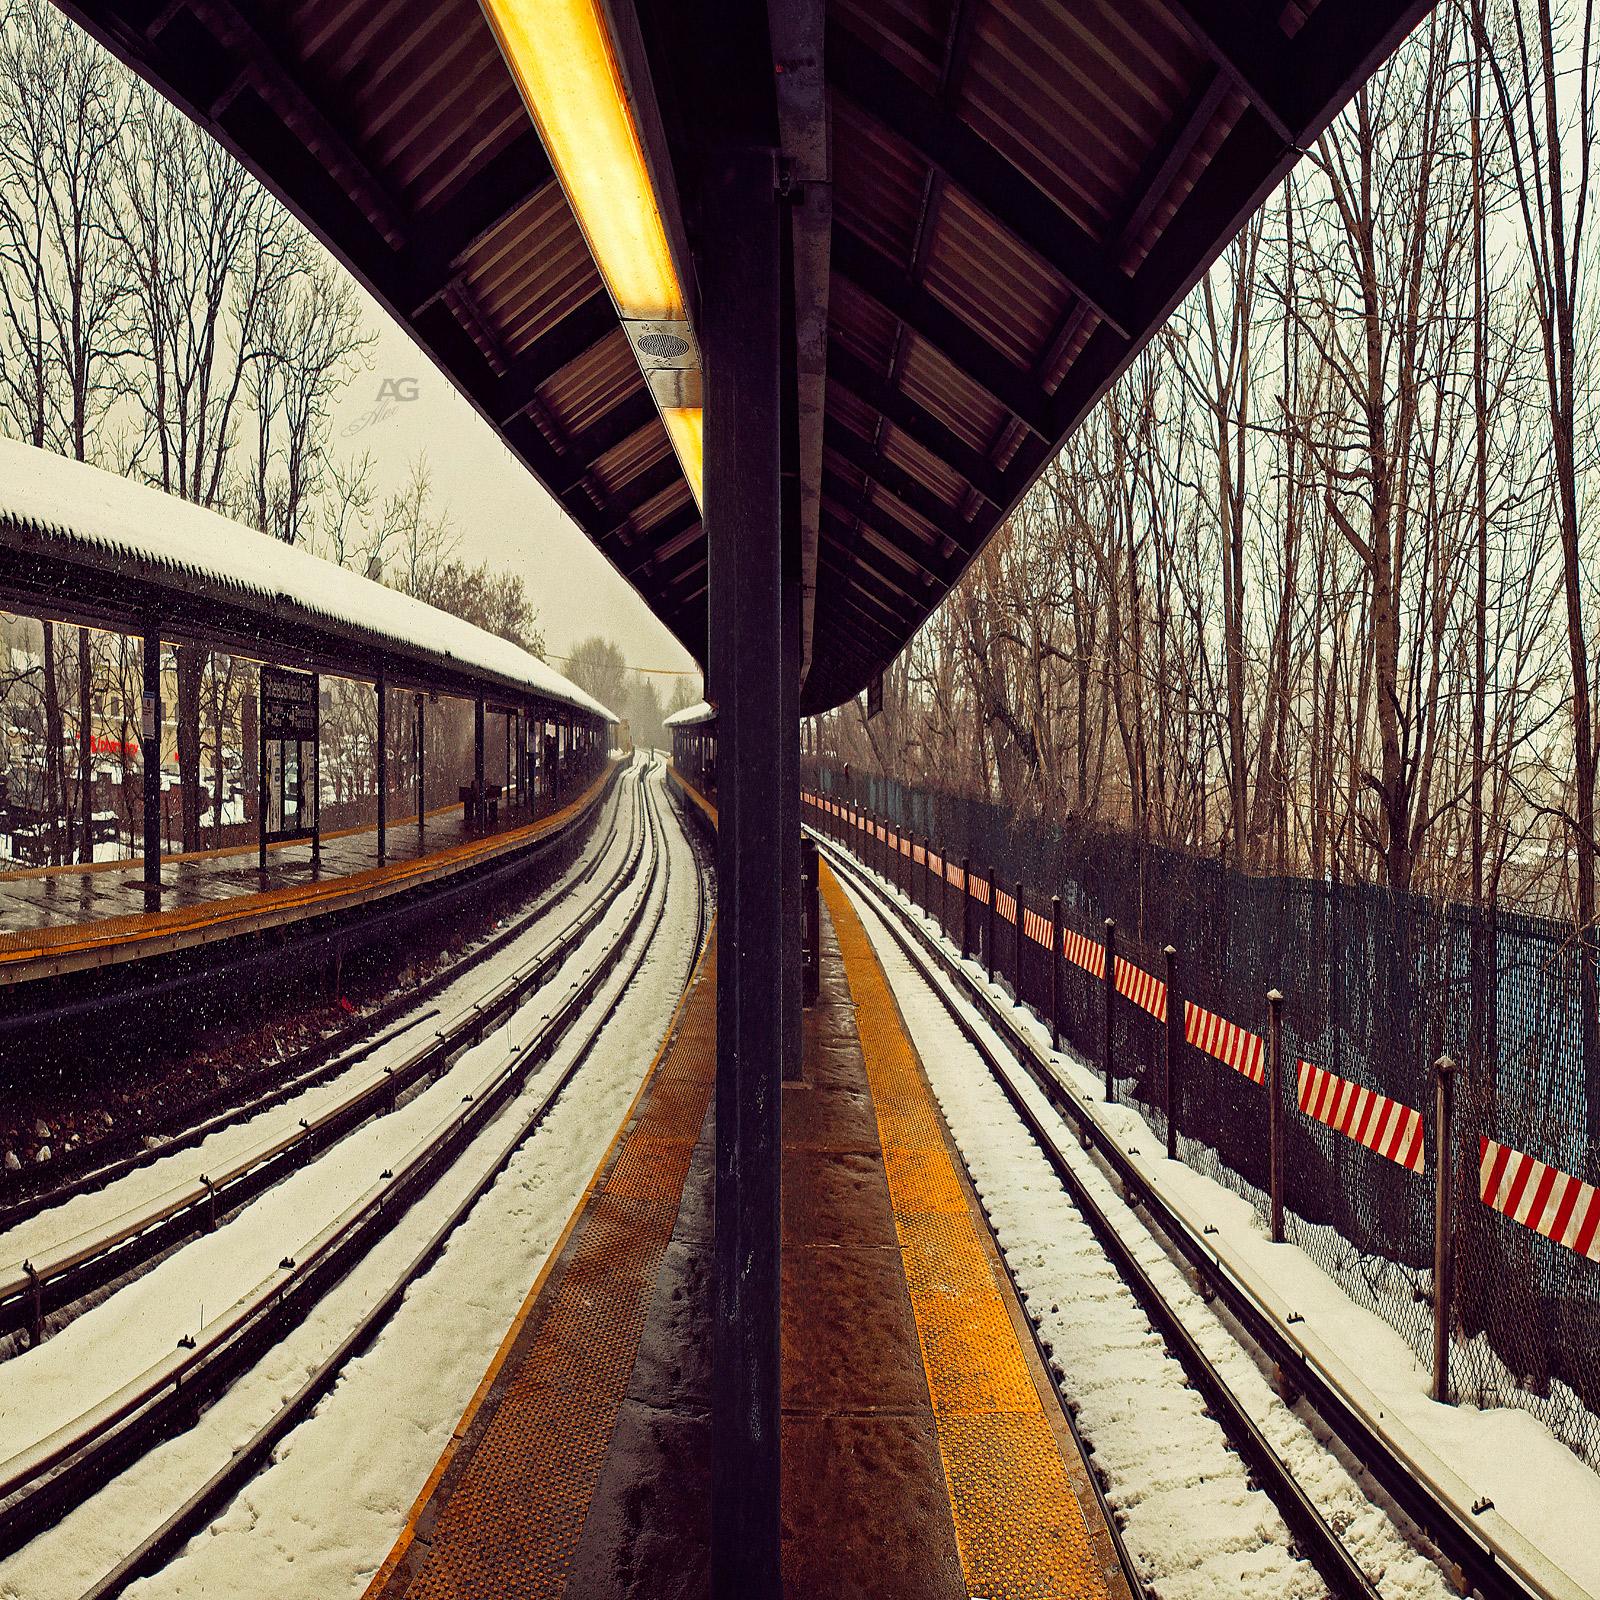 SheepsheadBay_TrainSubwayStation_UnderTheSnow_squished_1600